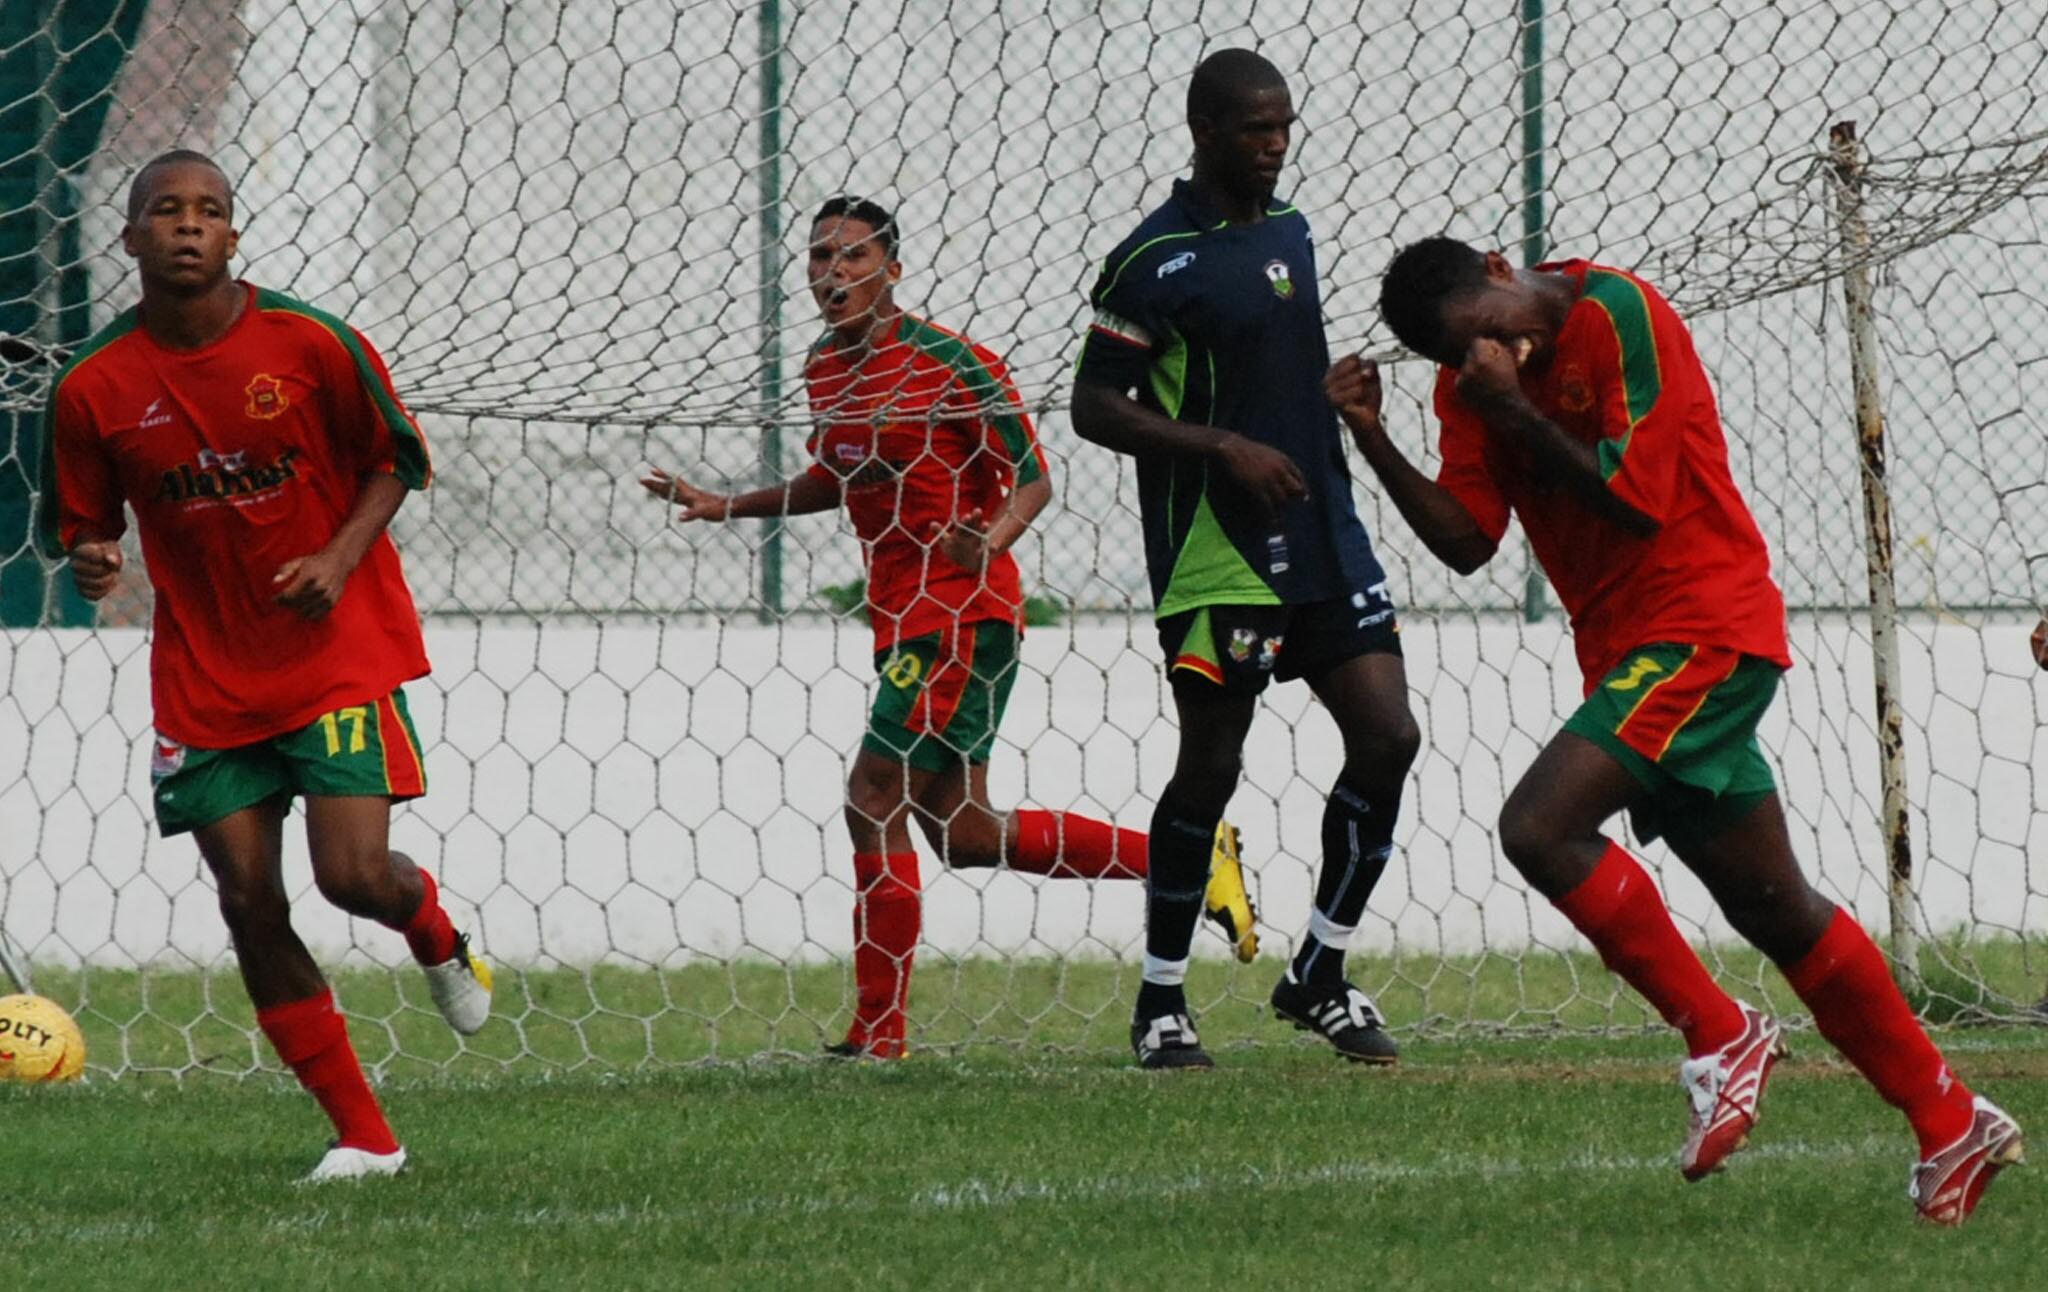 Festejo de un gol con Barranquilla. Atrás se ve a Bacca.